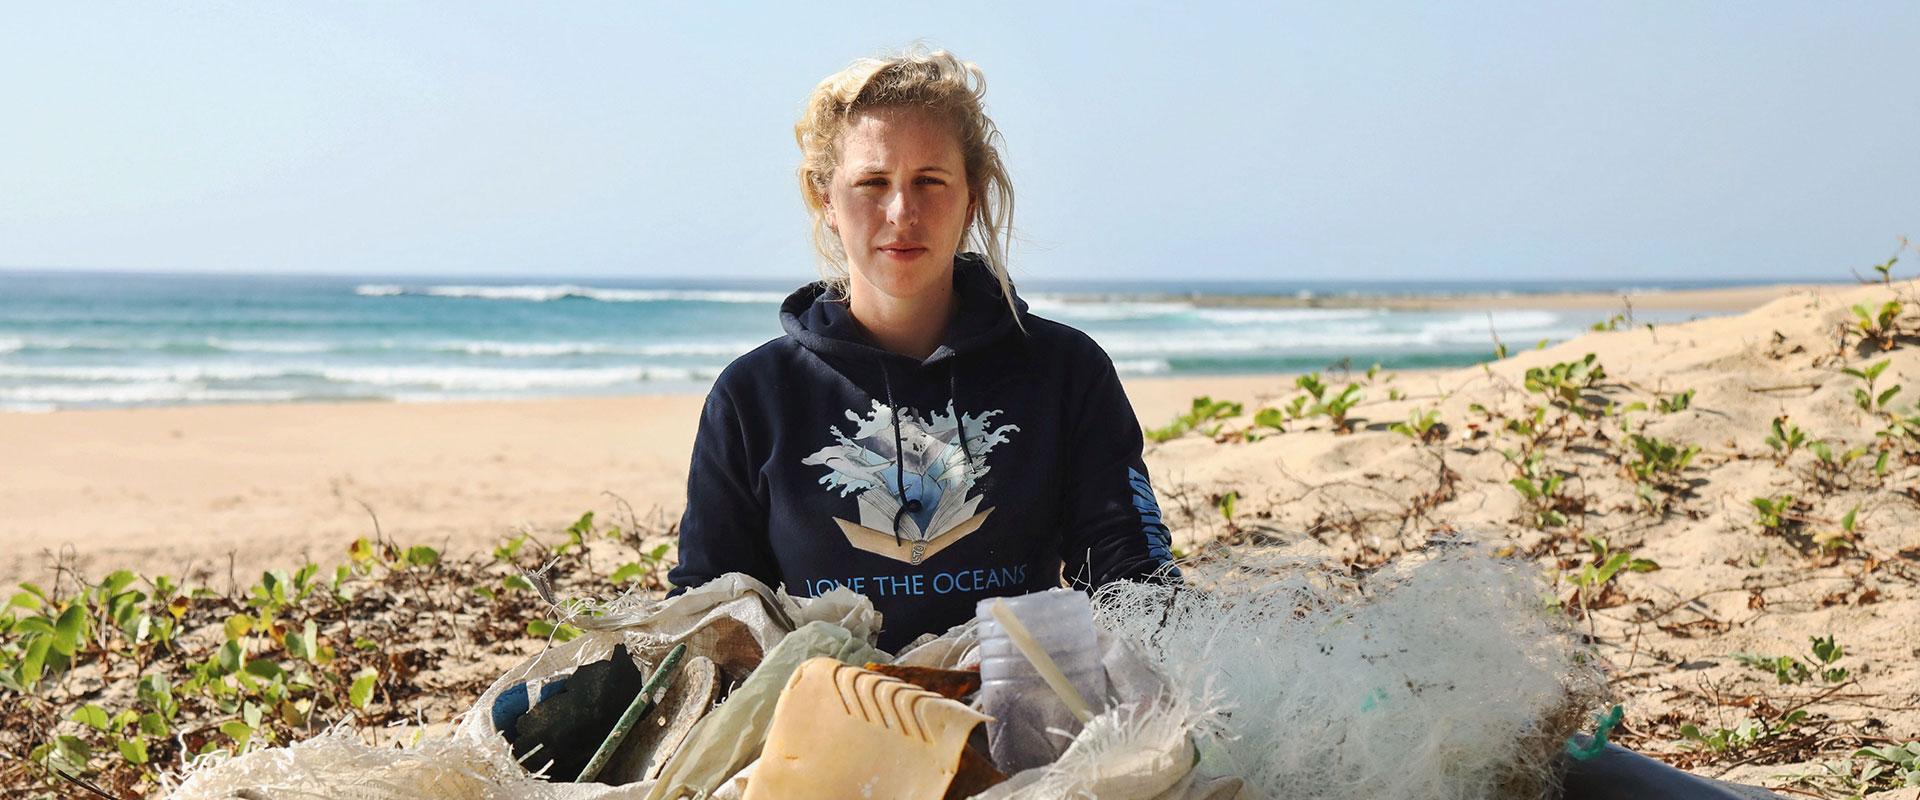 blog header meet love the oceans stella levantesi